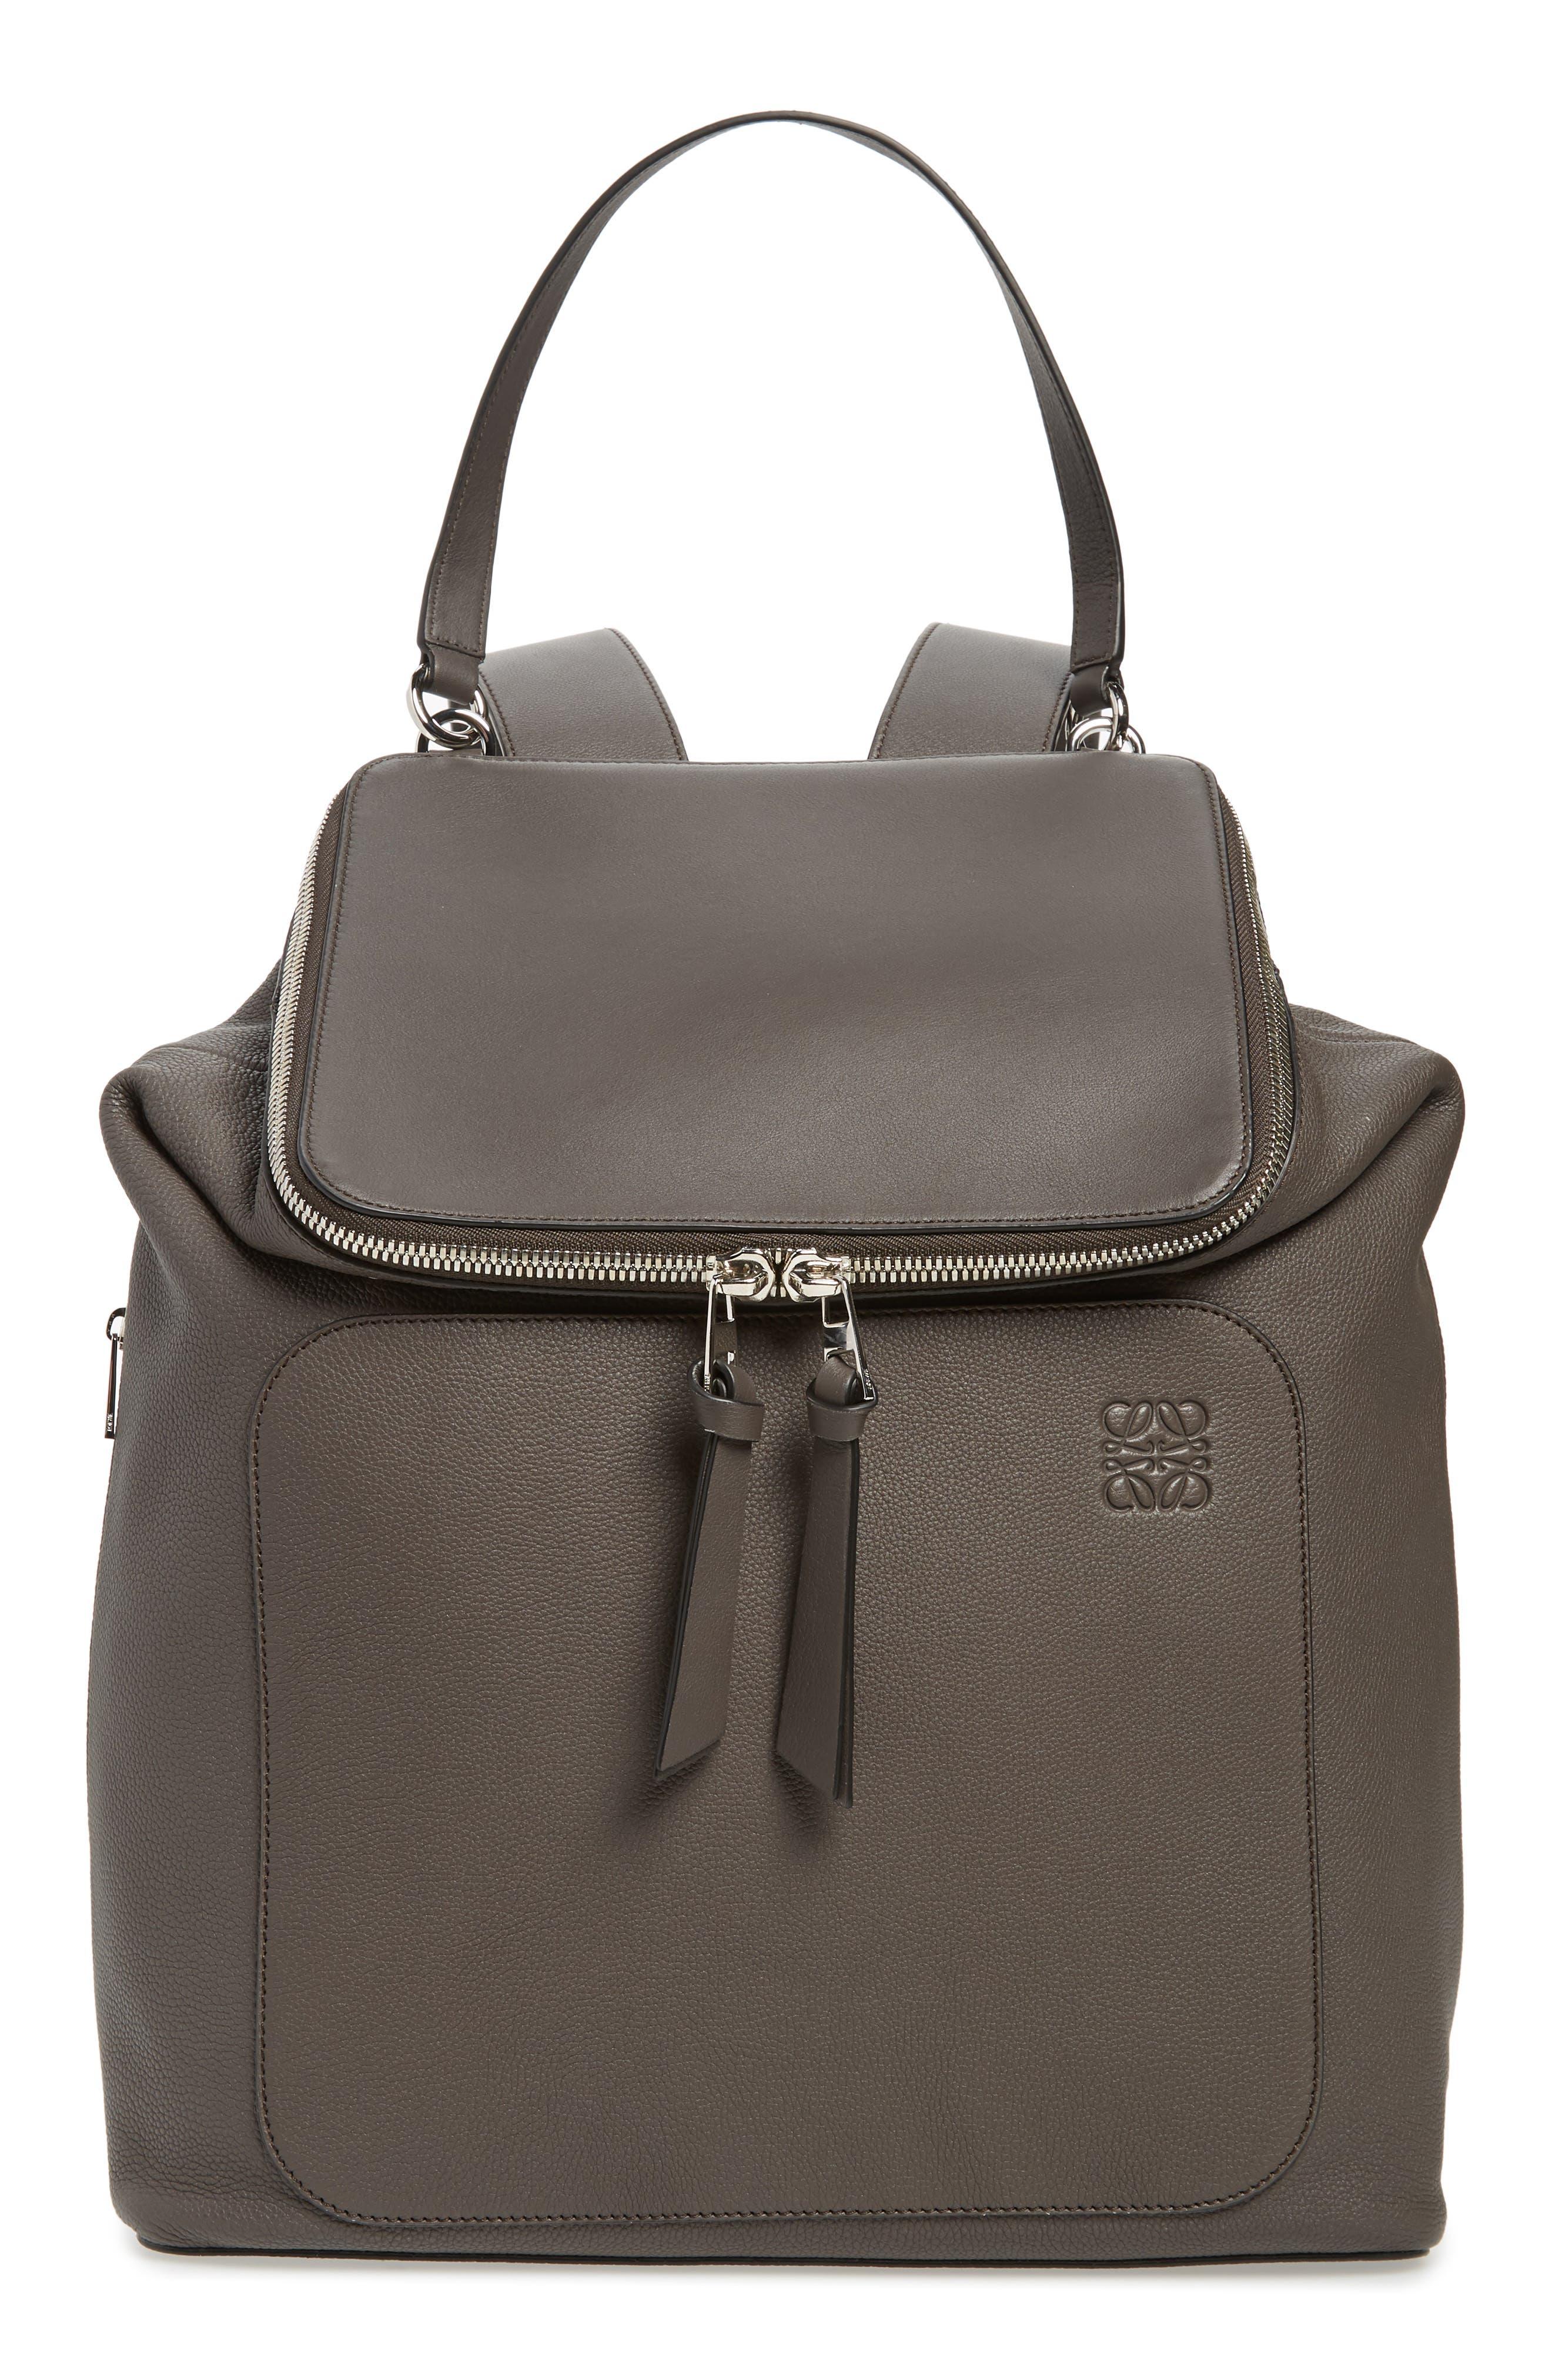 Goya Plaid Calfskin Leather Backpack,                             Main thumbnail 1, color,                             022